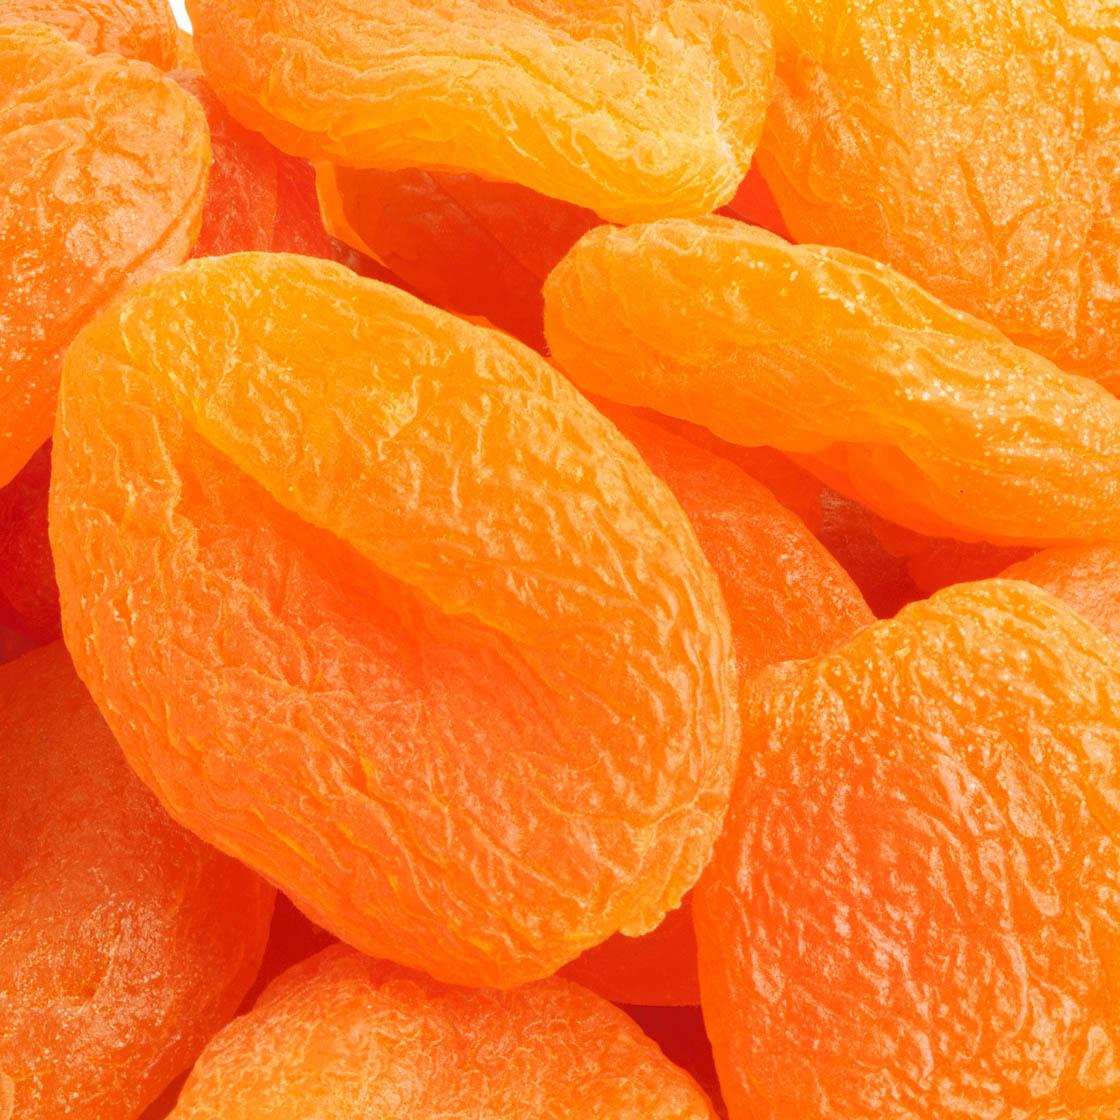 Apricots Whole - Unsulphured